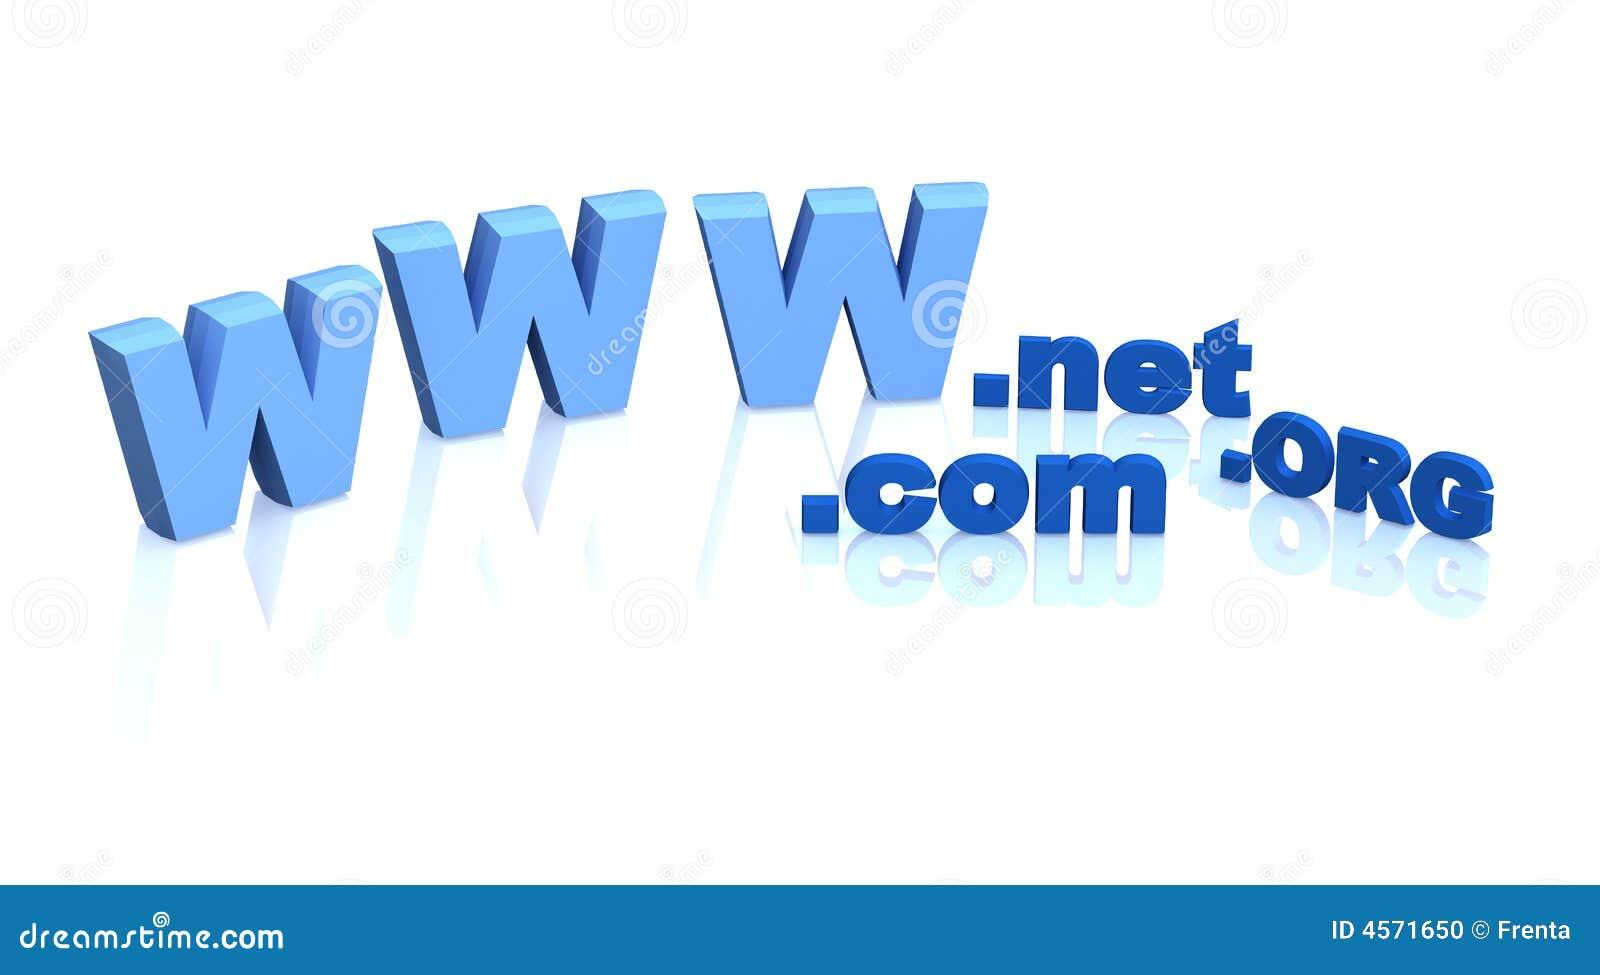 .org #